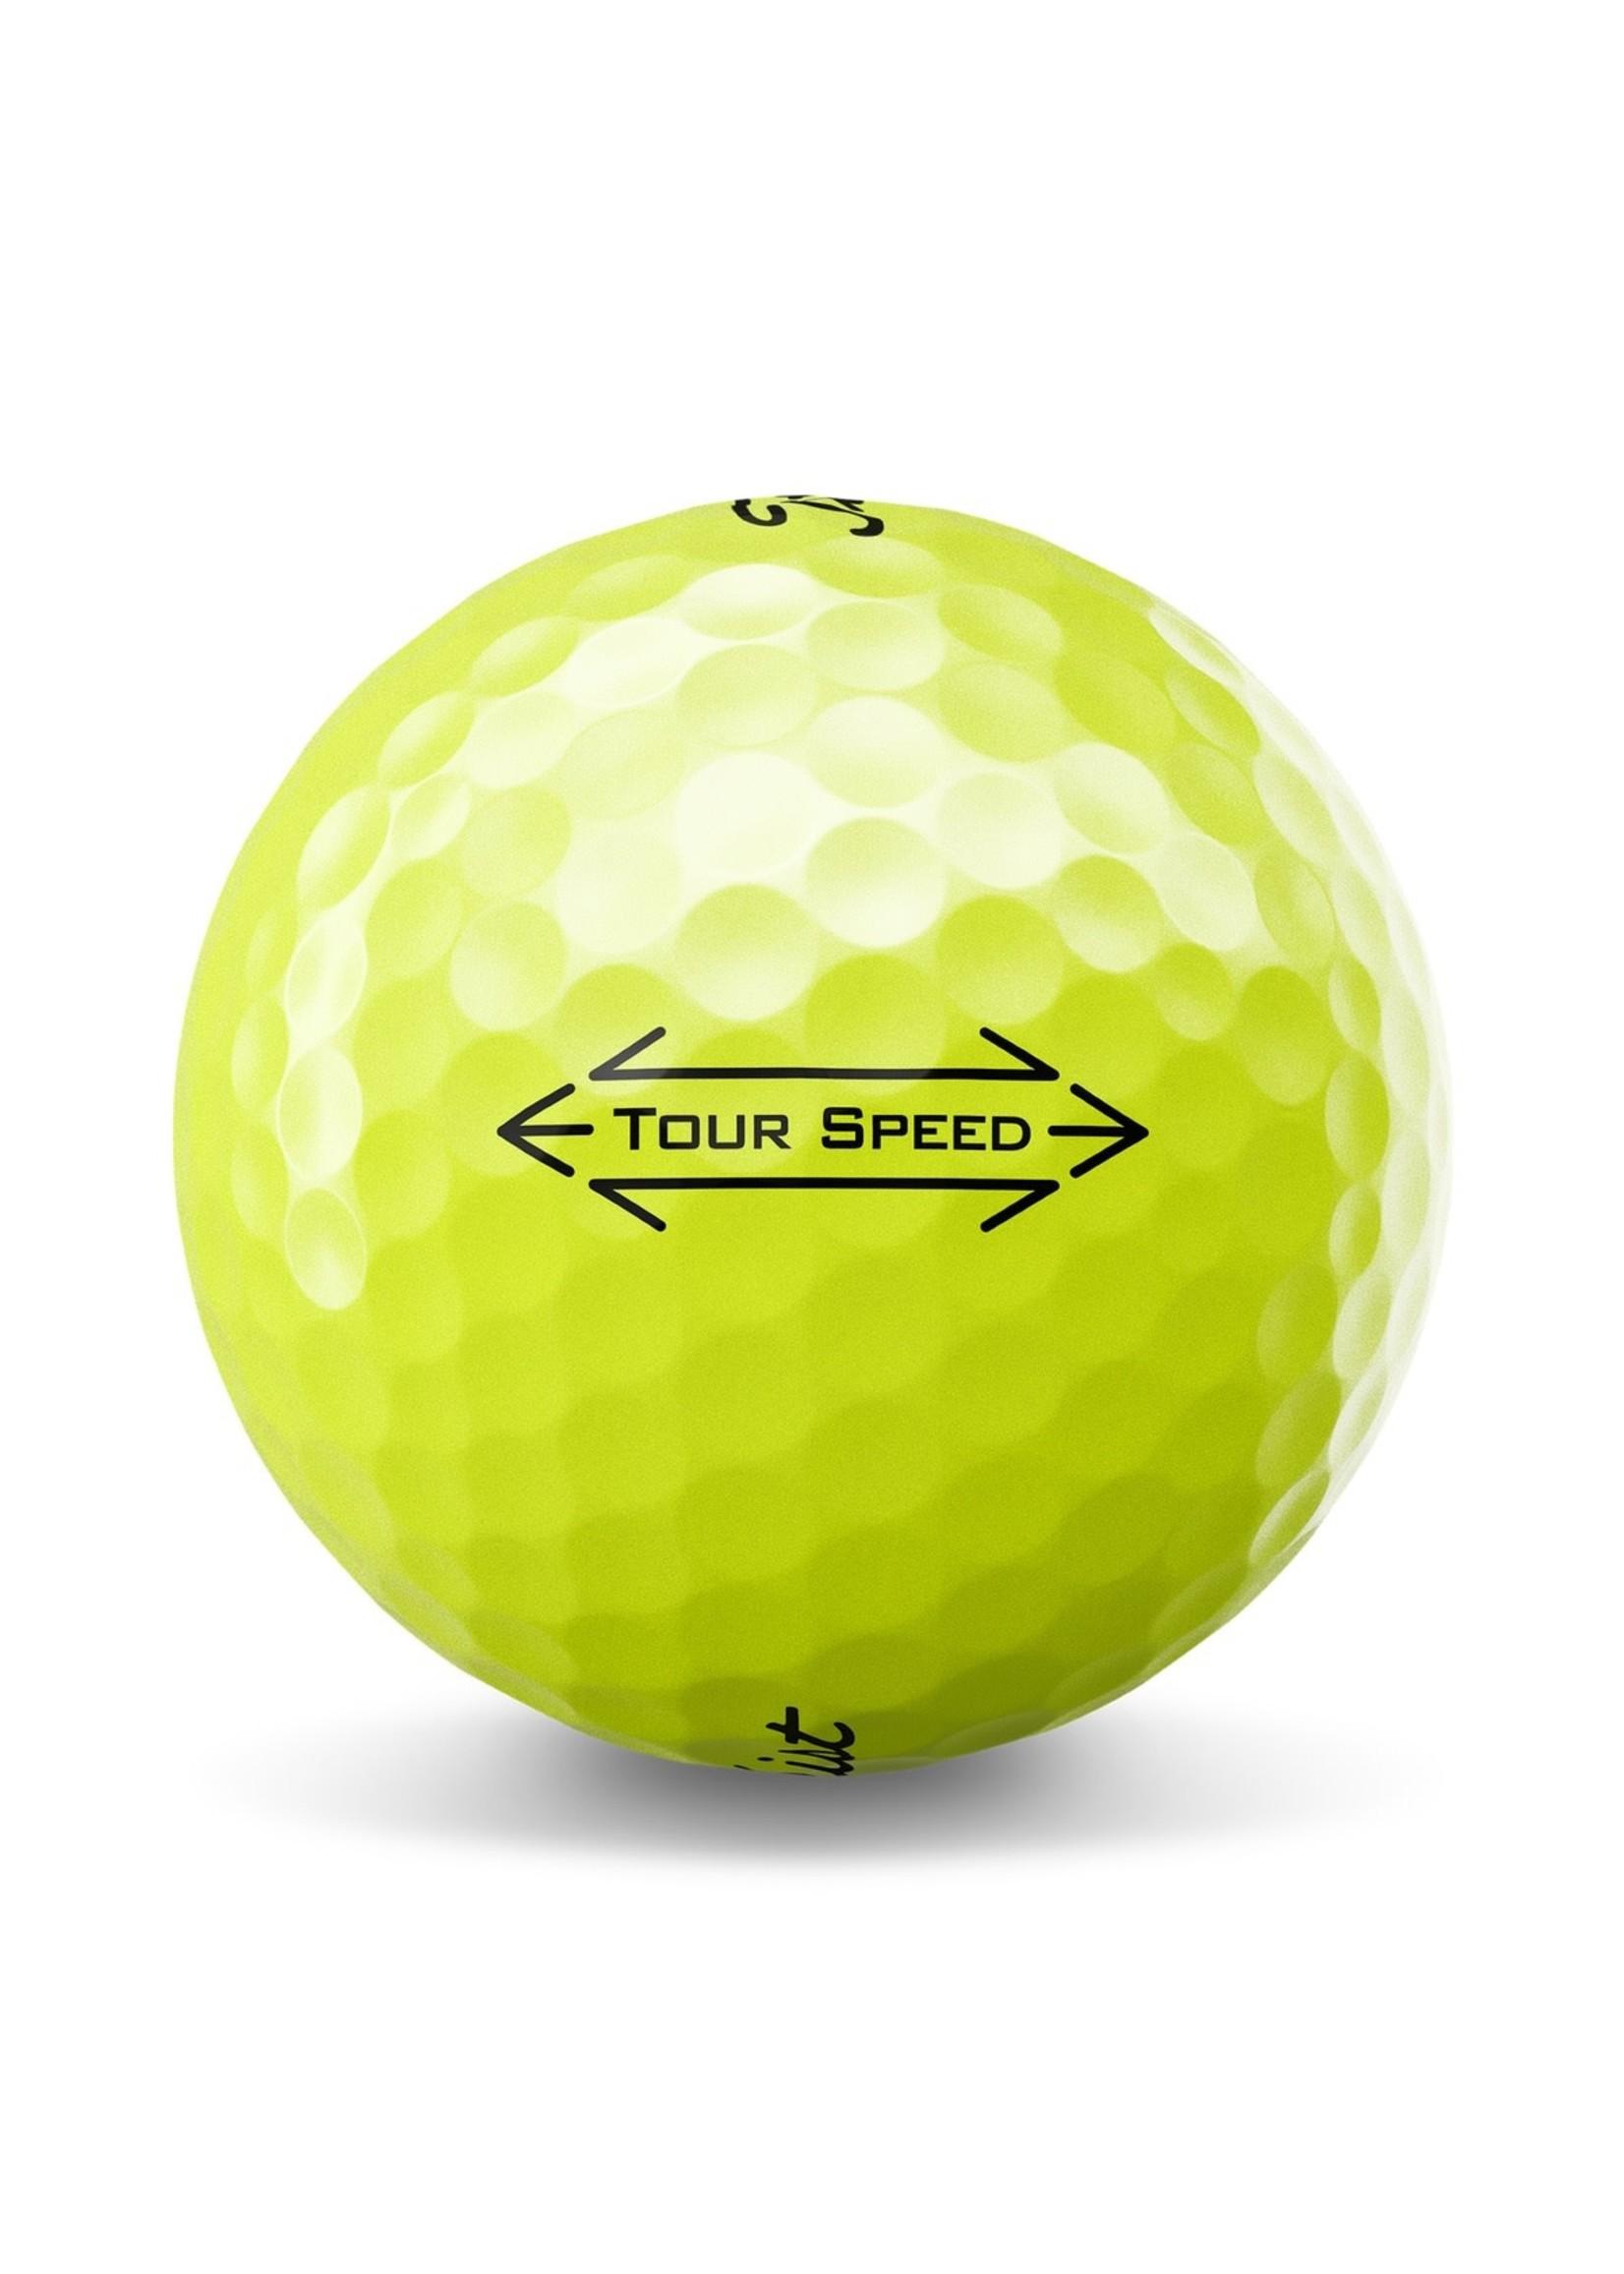 Titleist Titleist Tour Speed Dozen Pack Golf Balls (2021) - Yellow